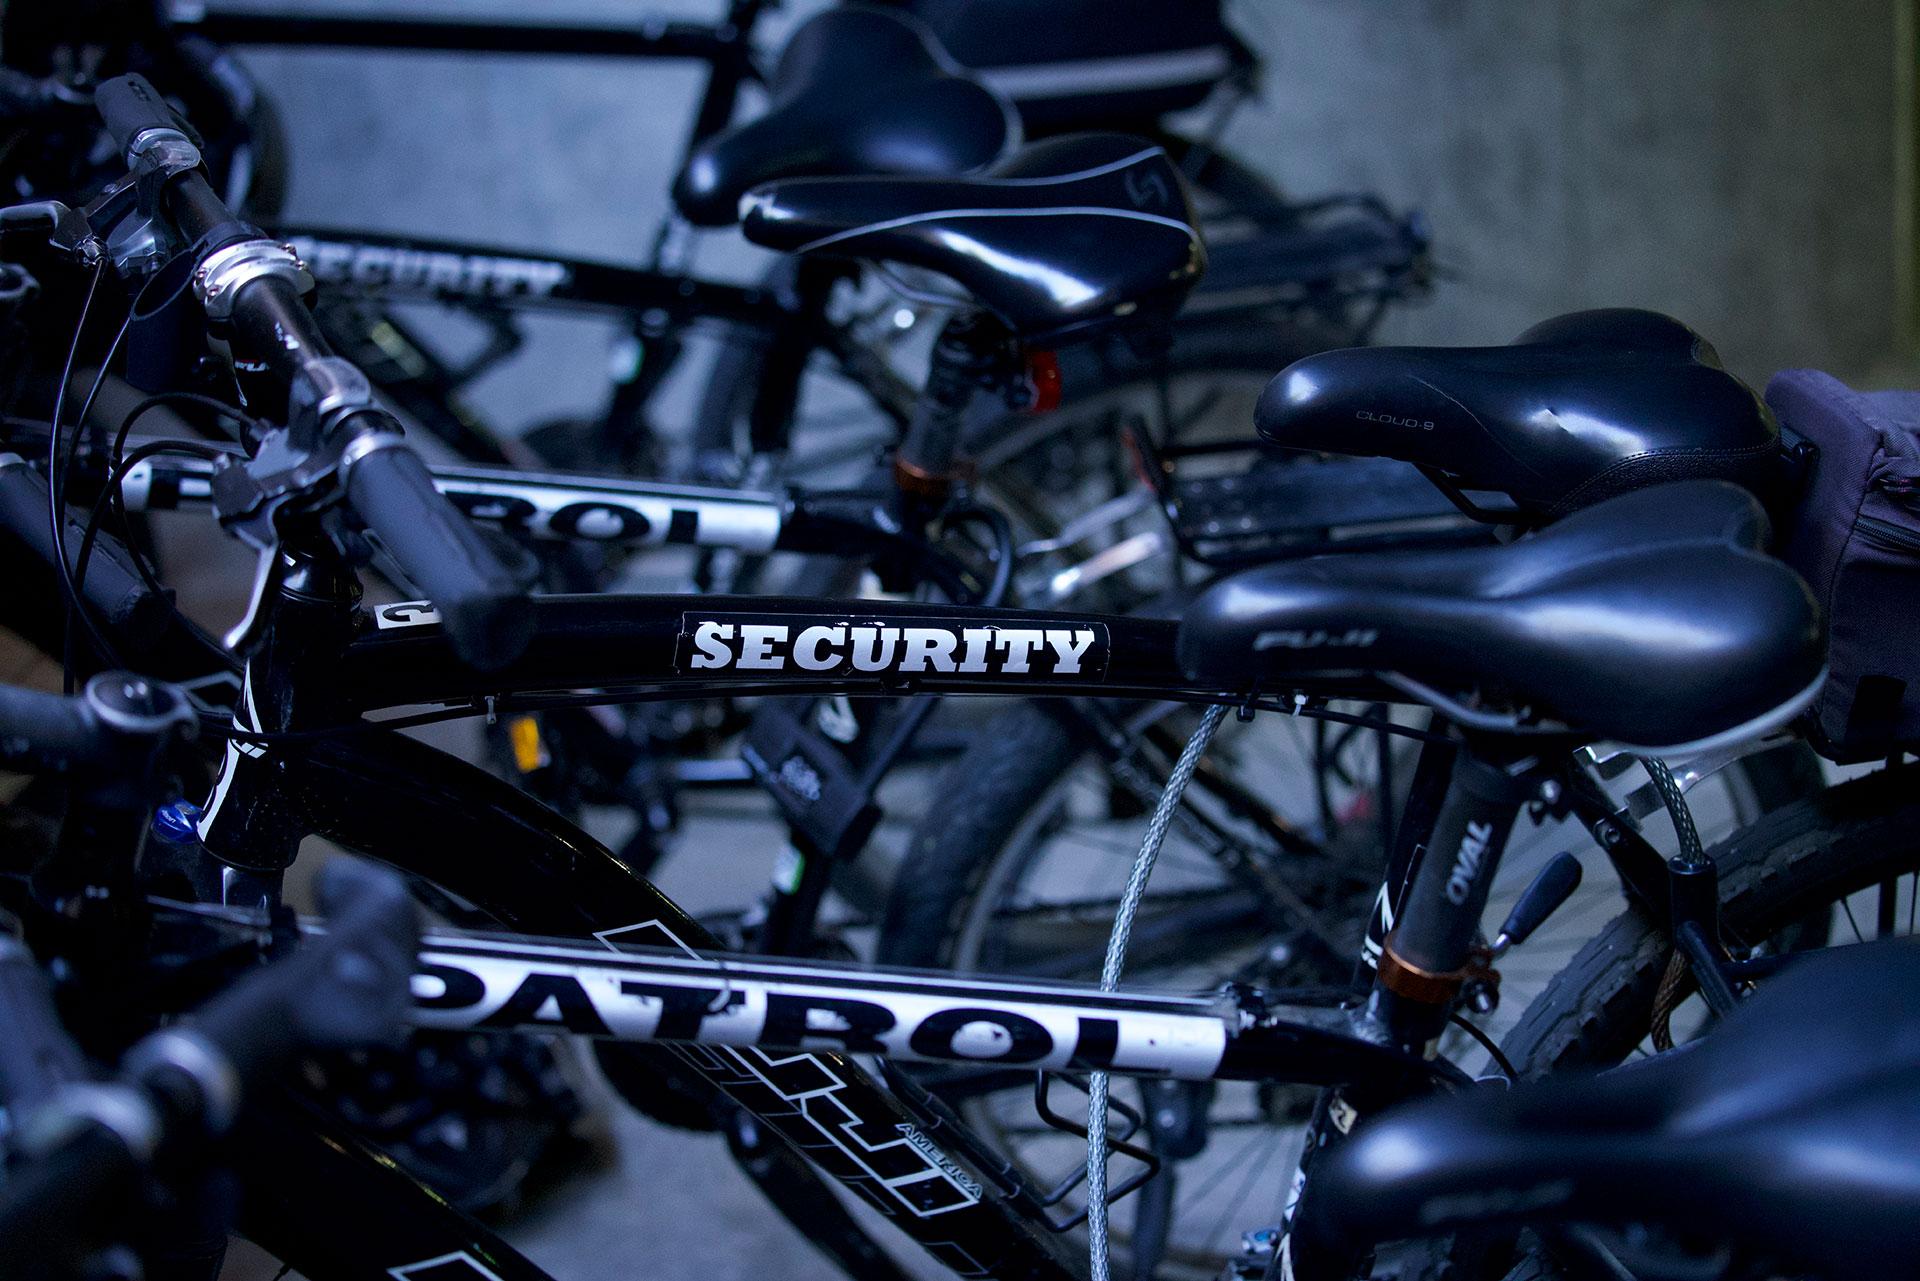 security bike